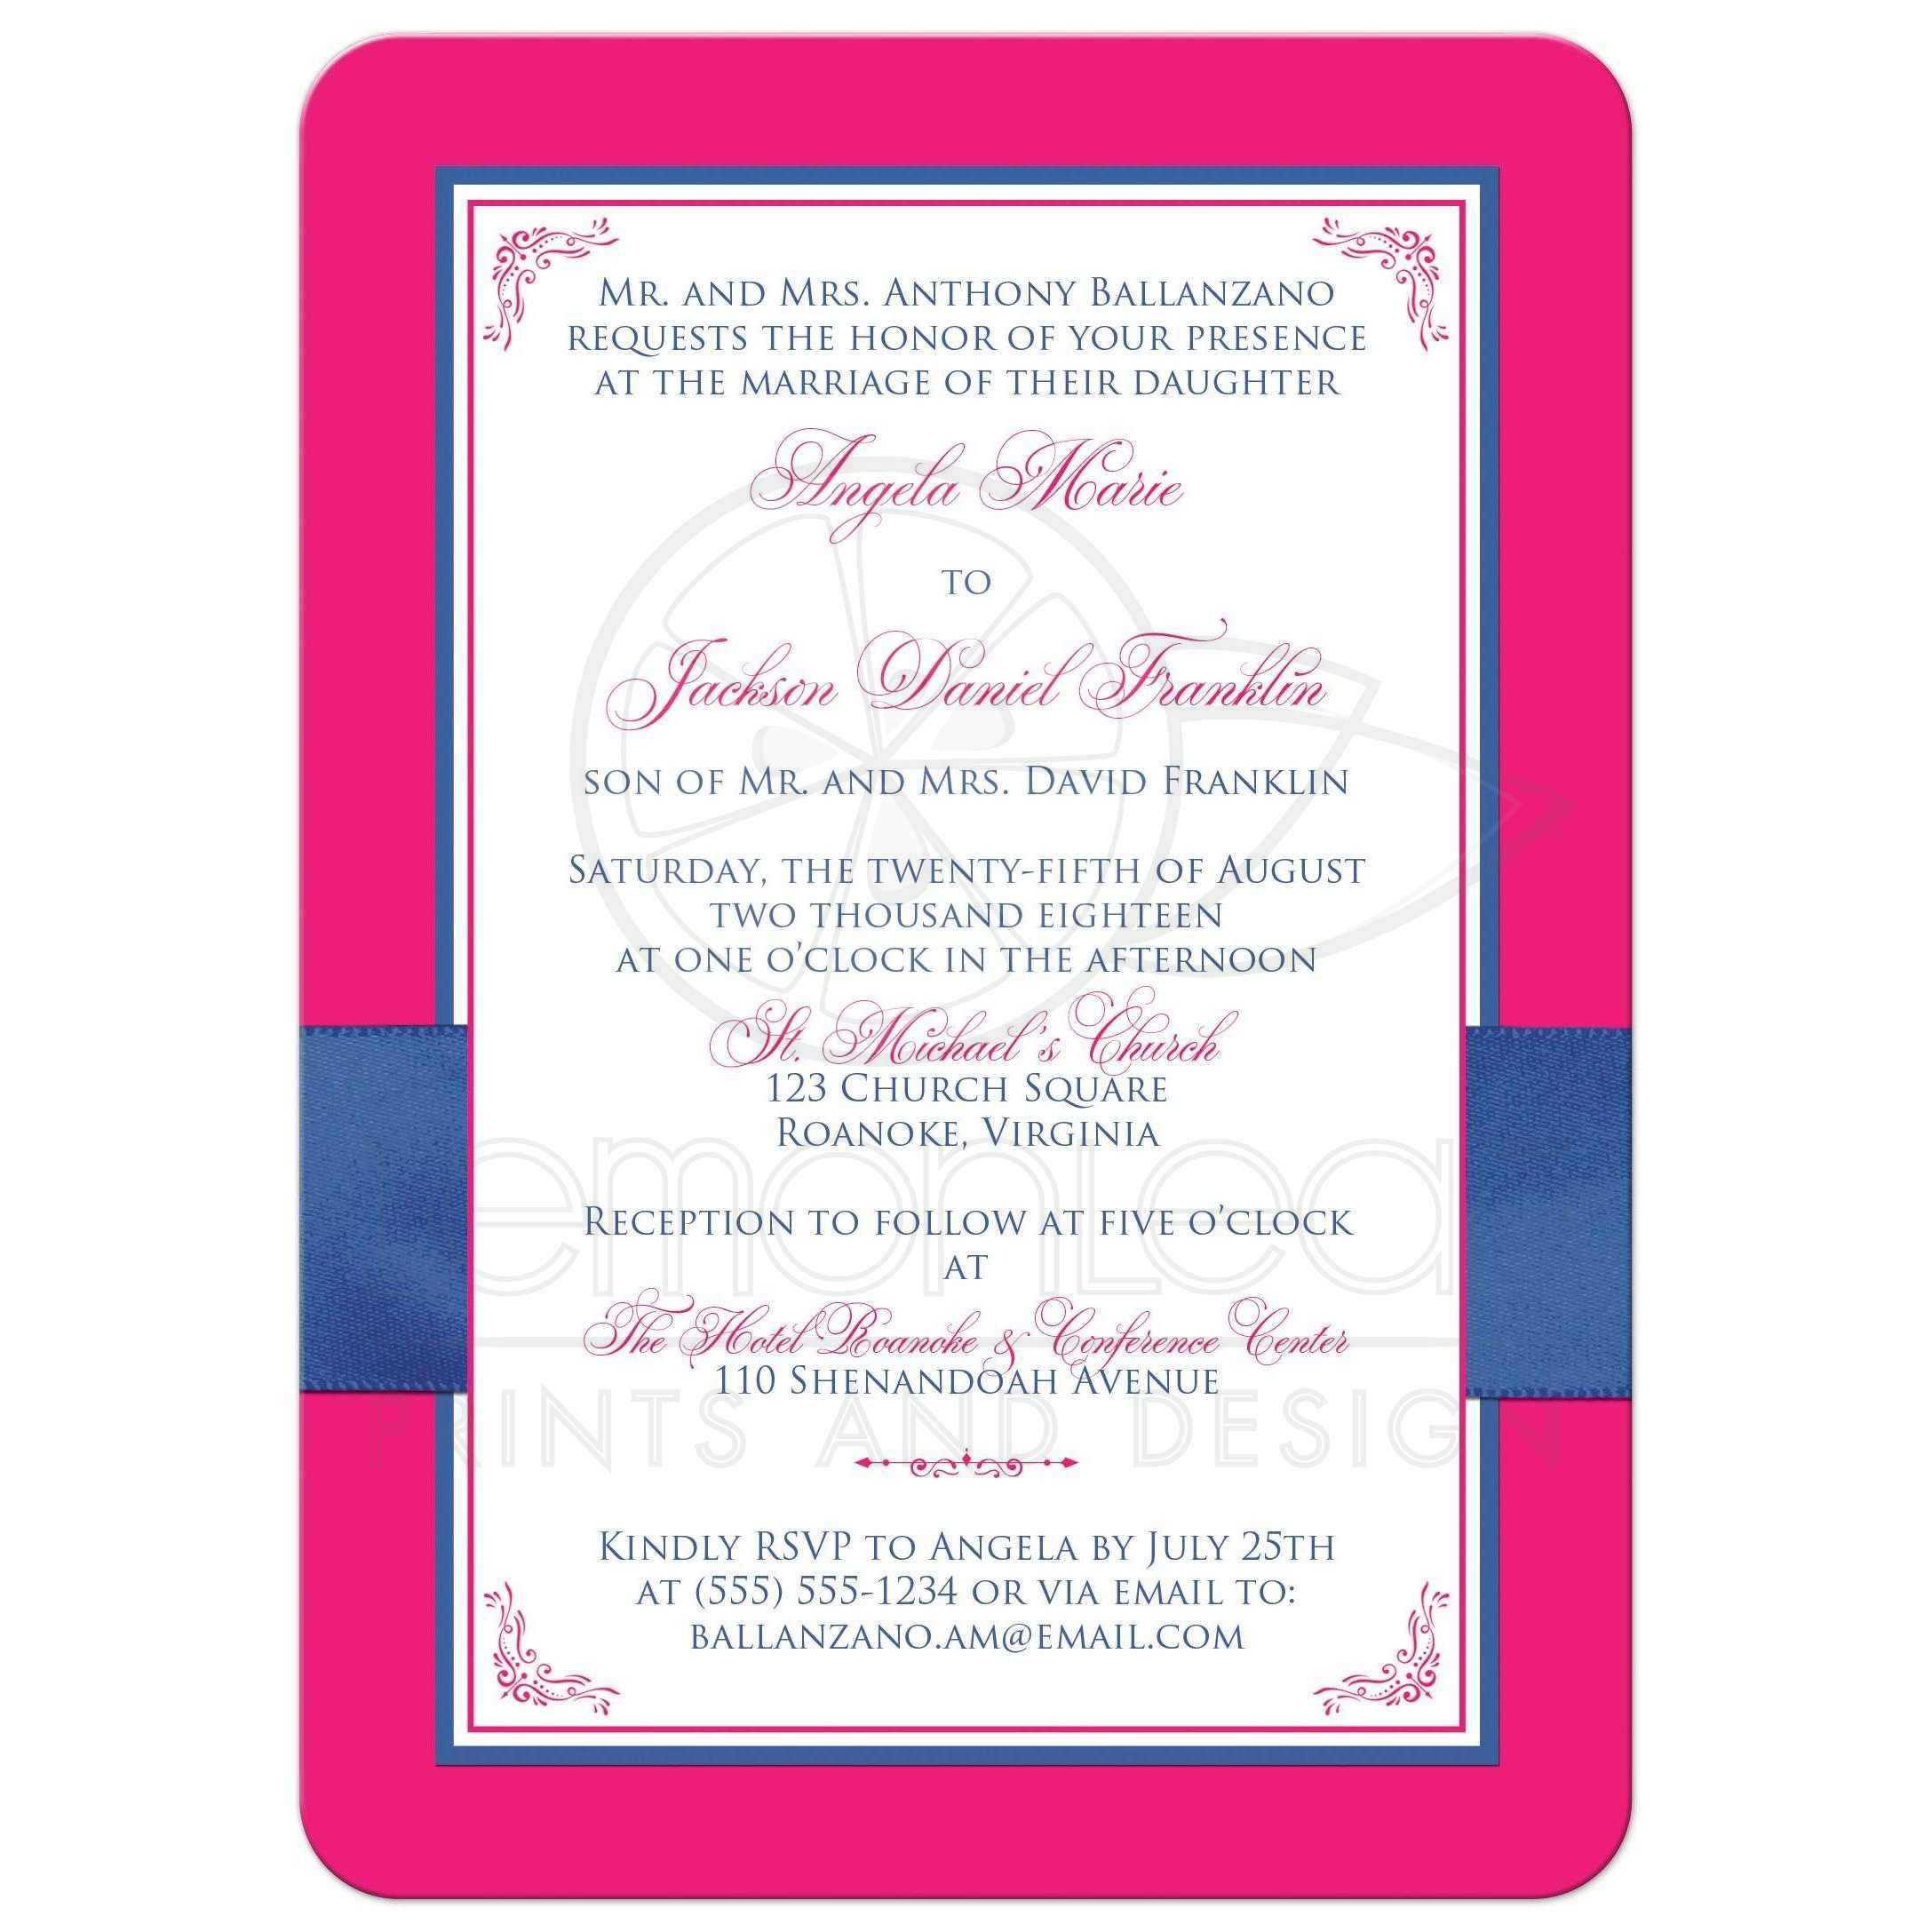 Hot Pink, White Floral, PRINTED Royal Blue Ribbon Wedding Invitation ...